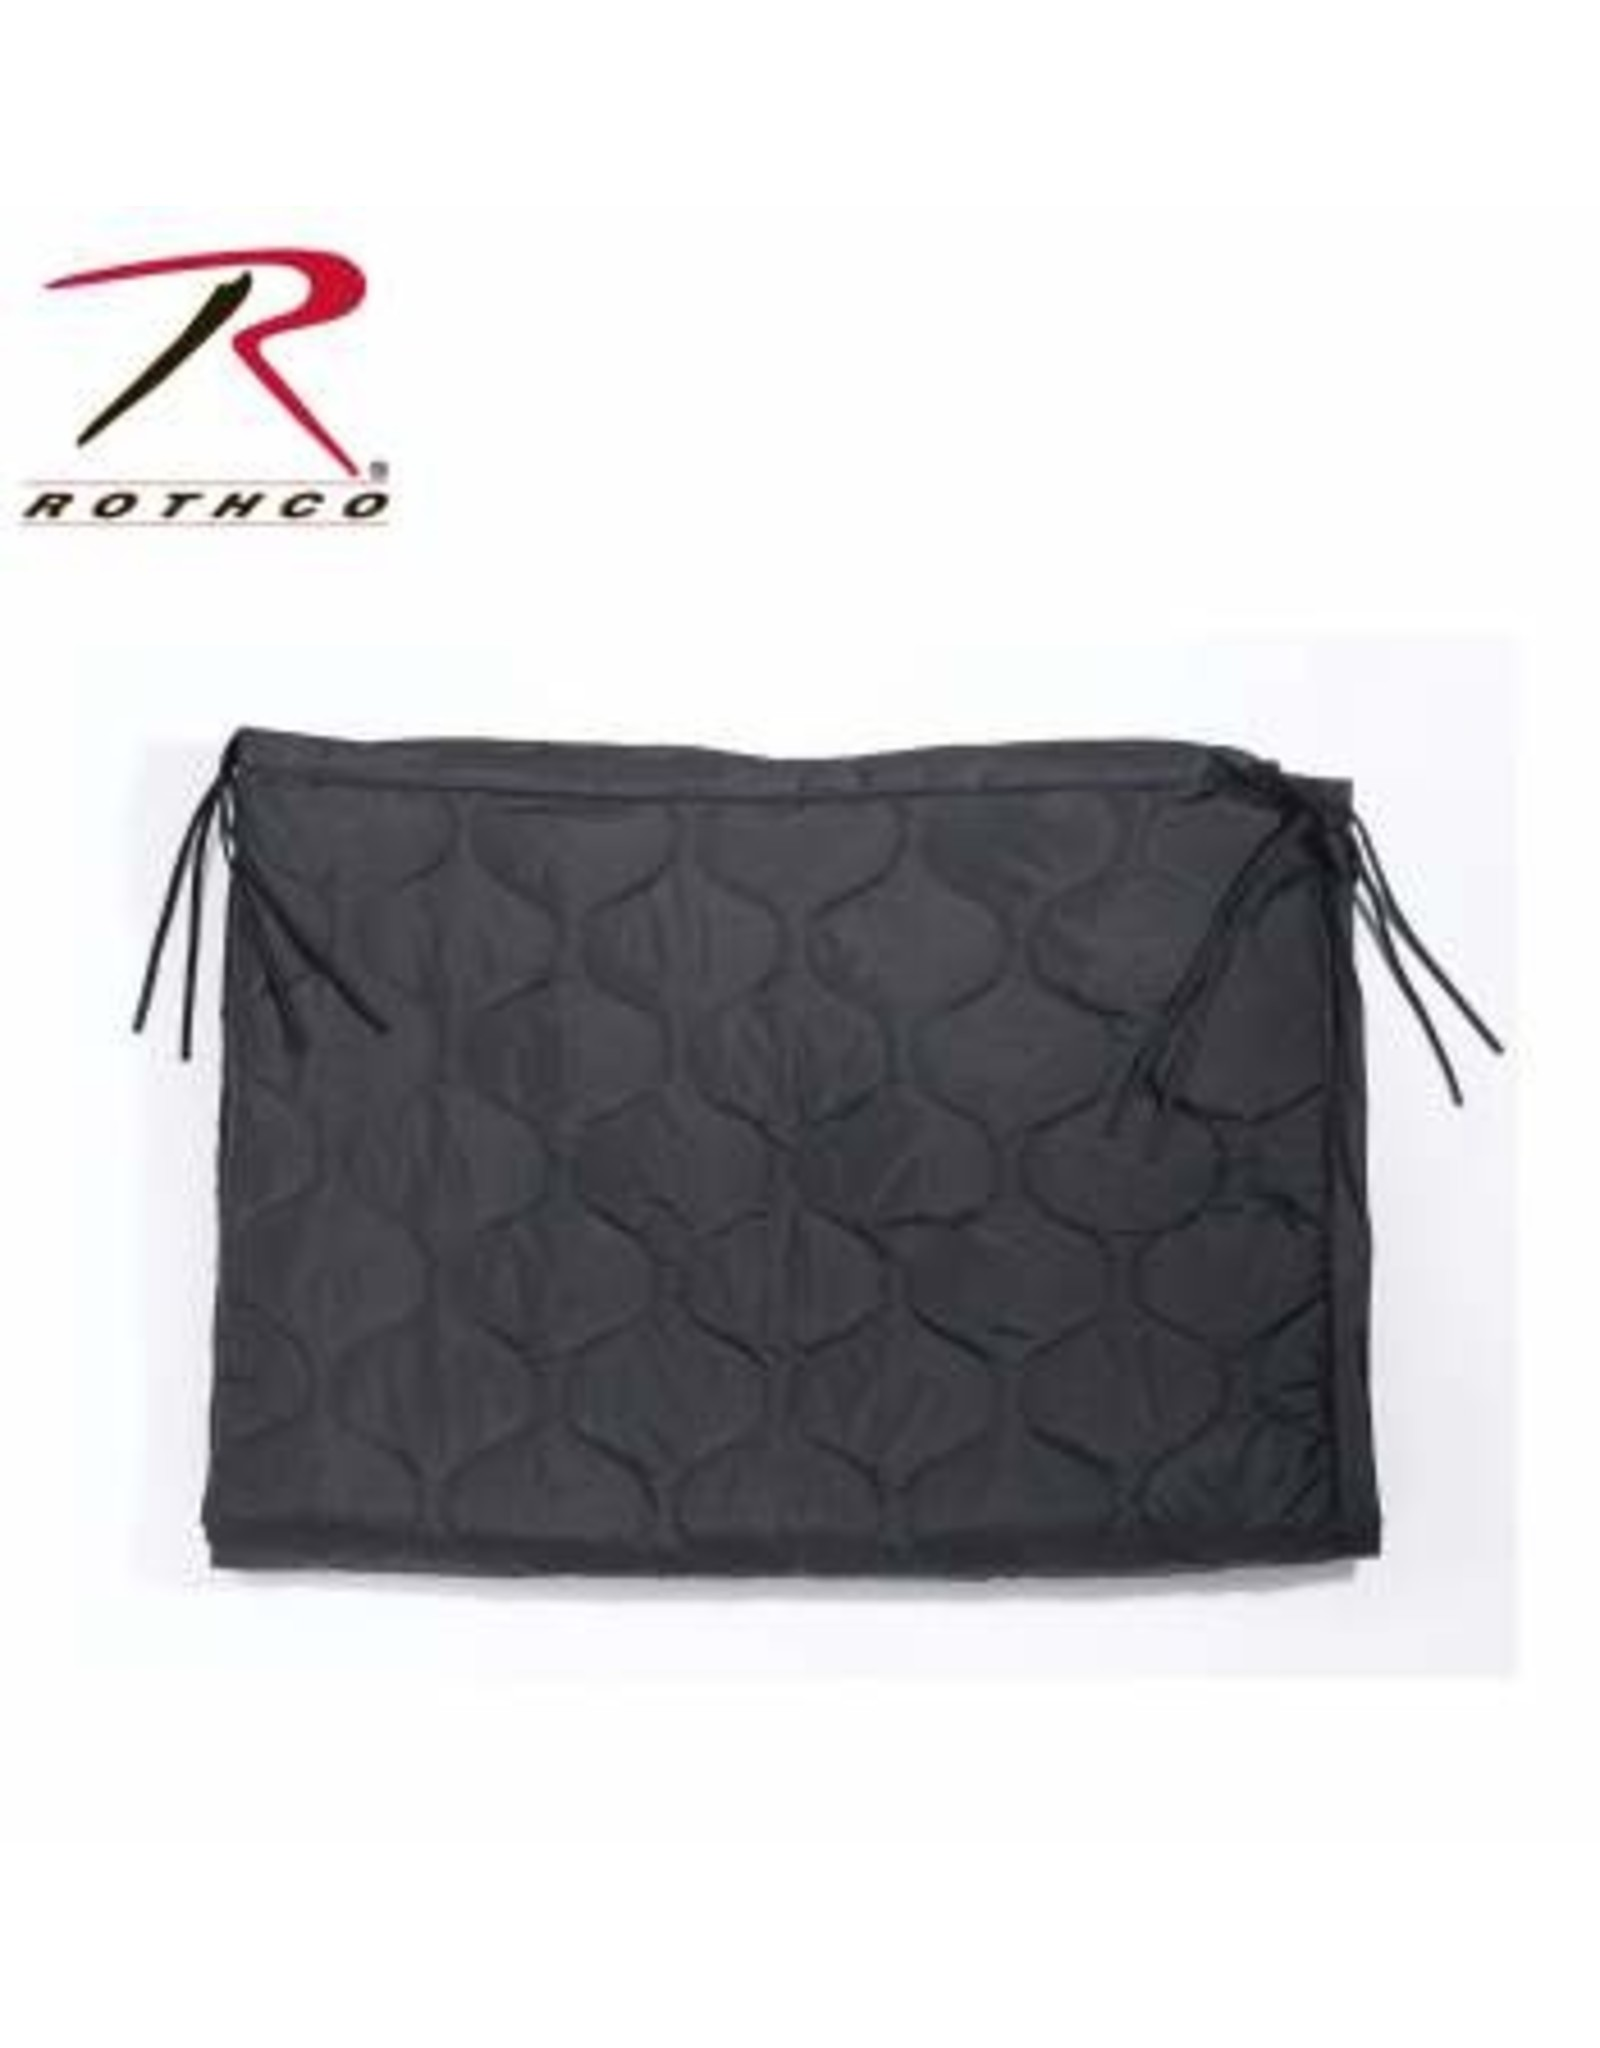 ROTHCO ROTHCO BLACK RANGER/ PONCHO LINER -NEW